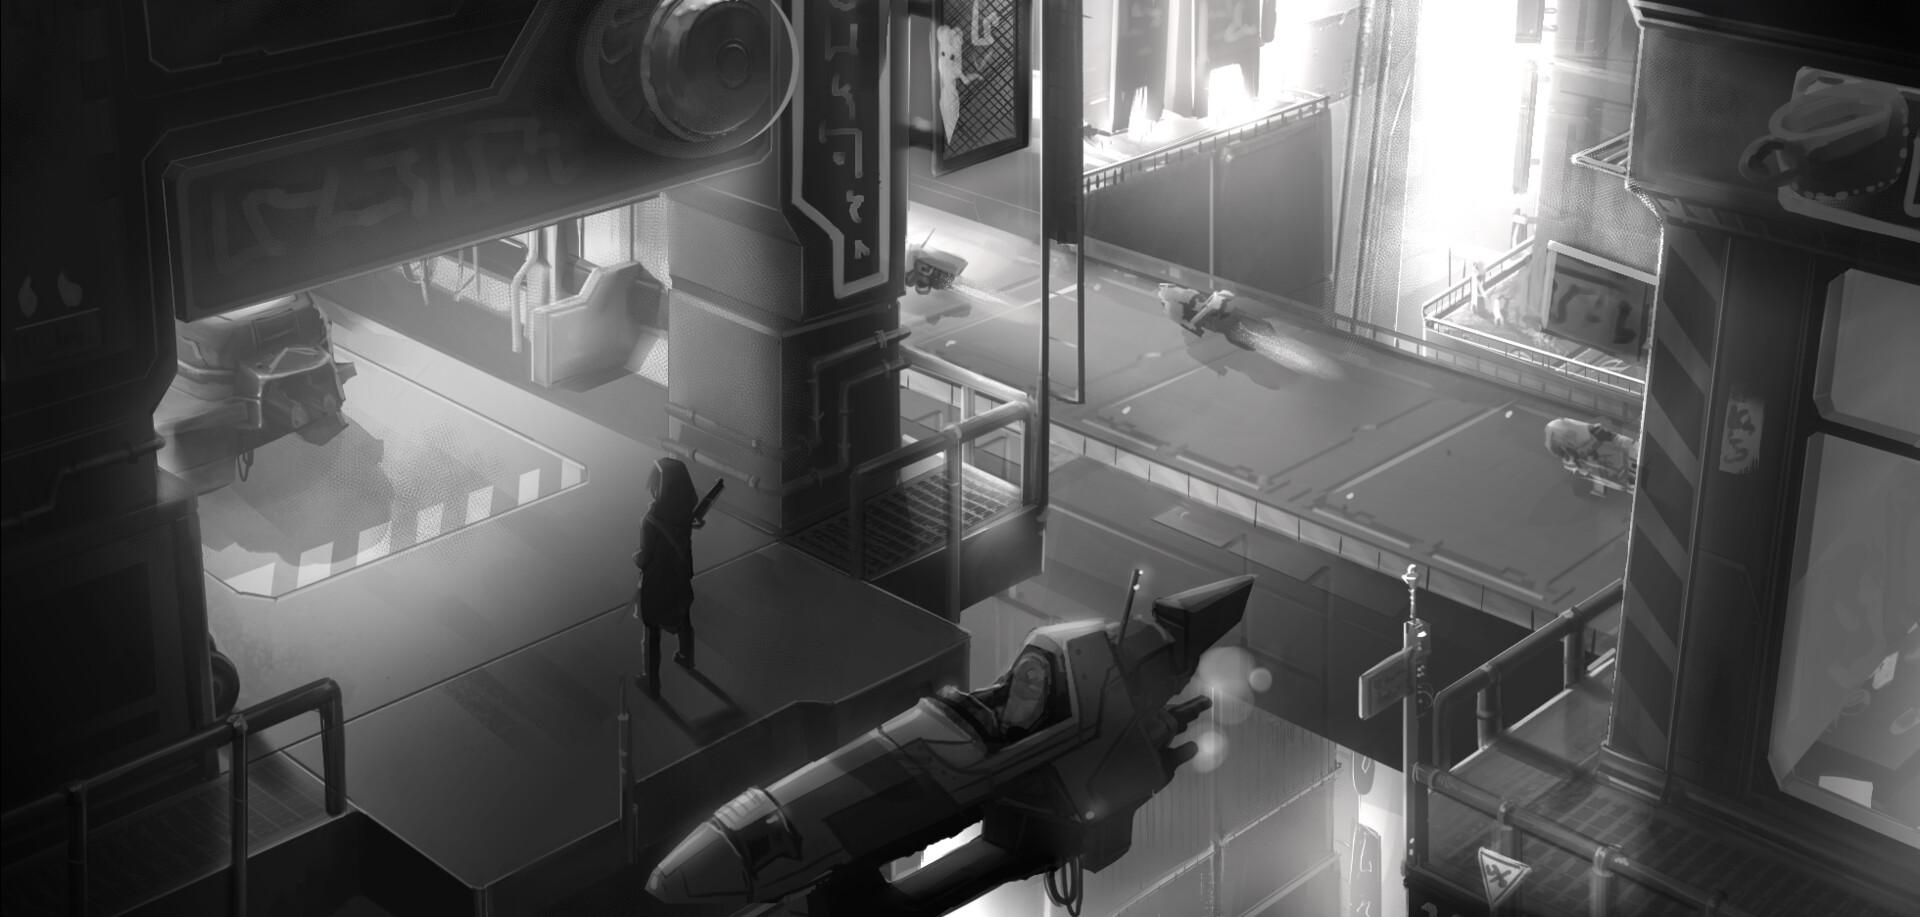 Concepting - Scifi spaceport